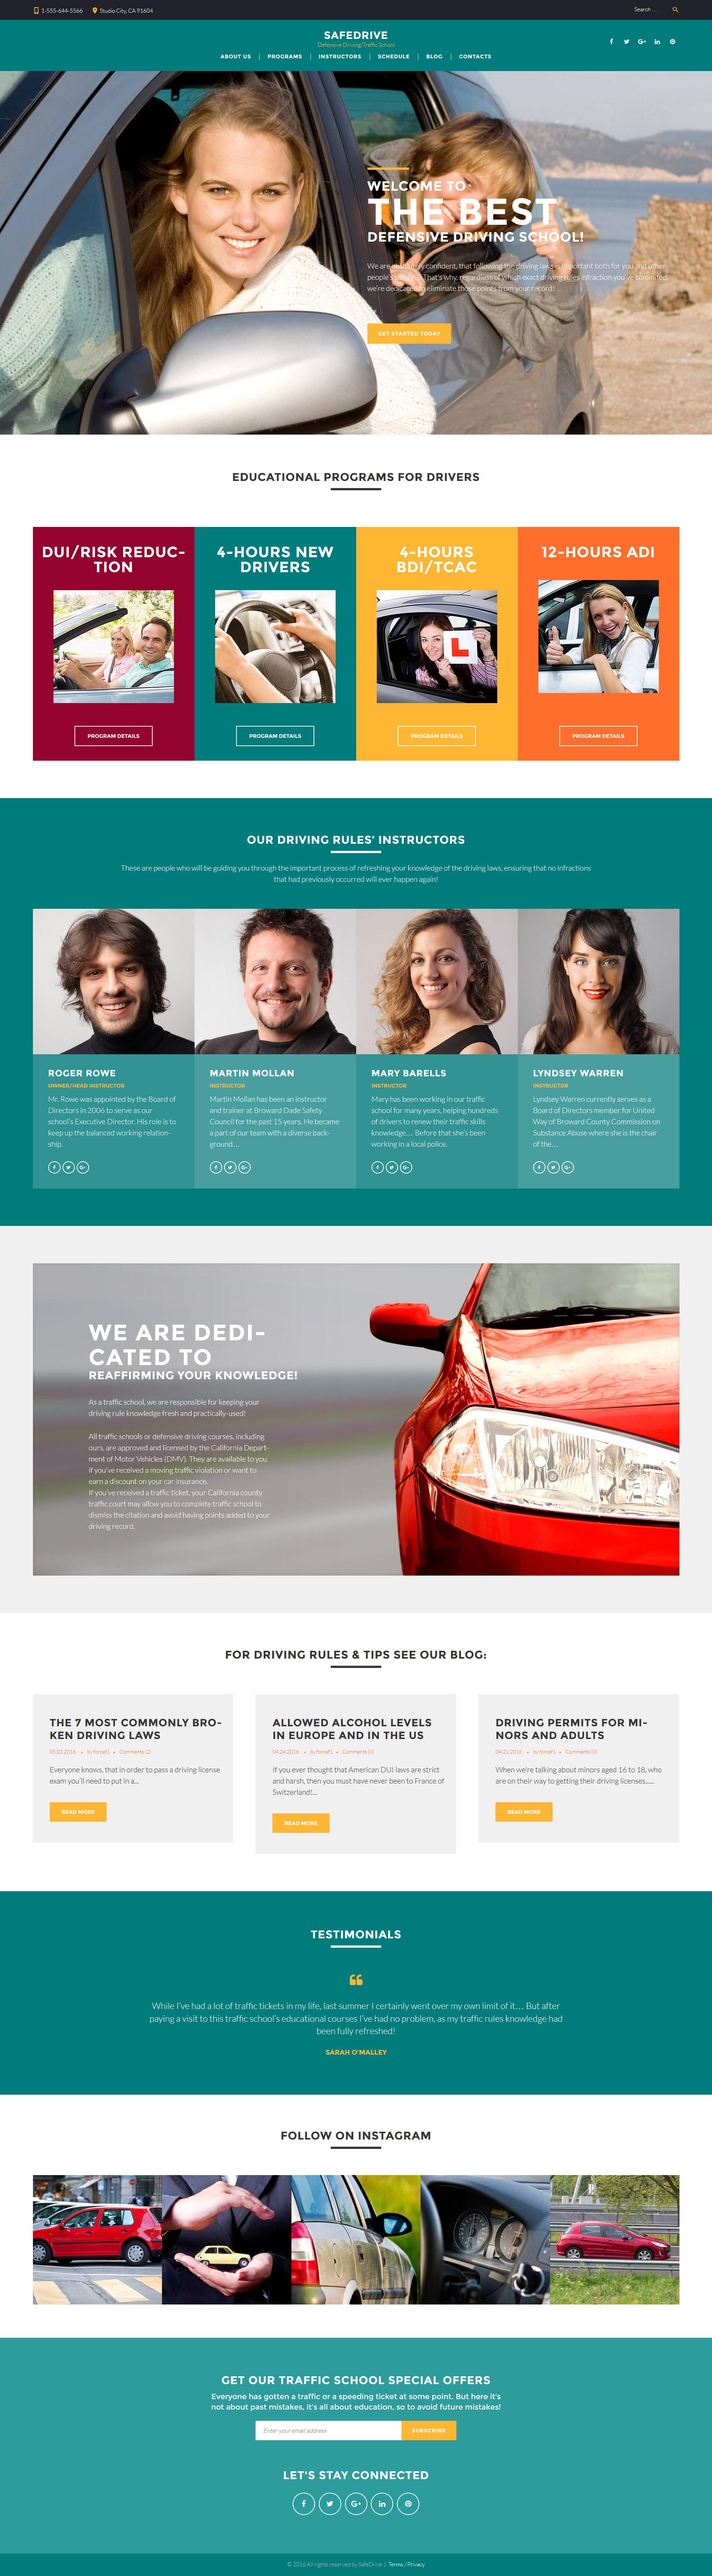 SafeDrive - Driving School Responsive №60127 - скриншот